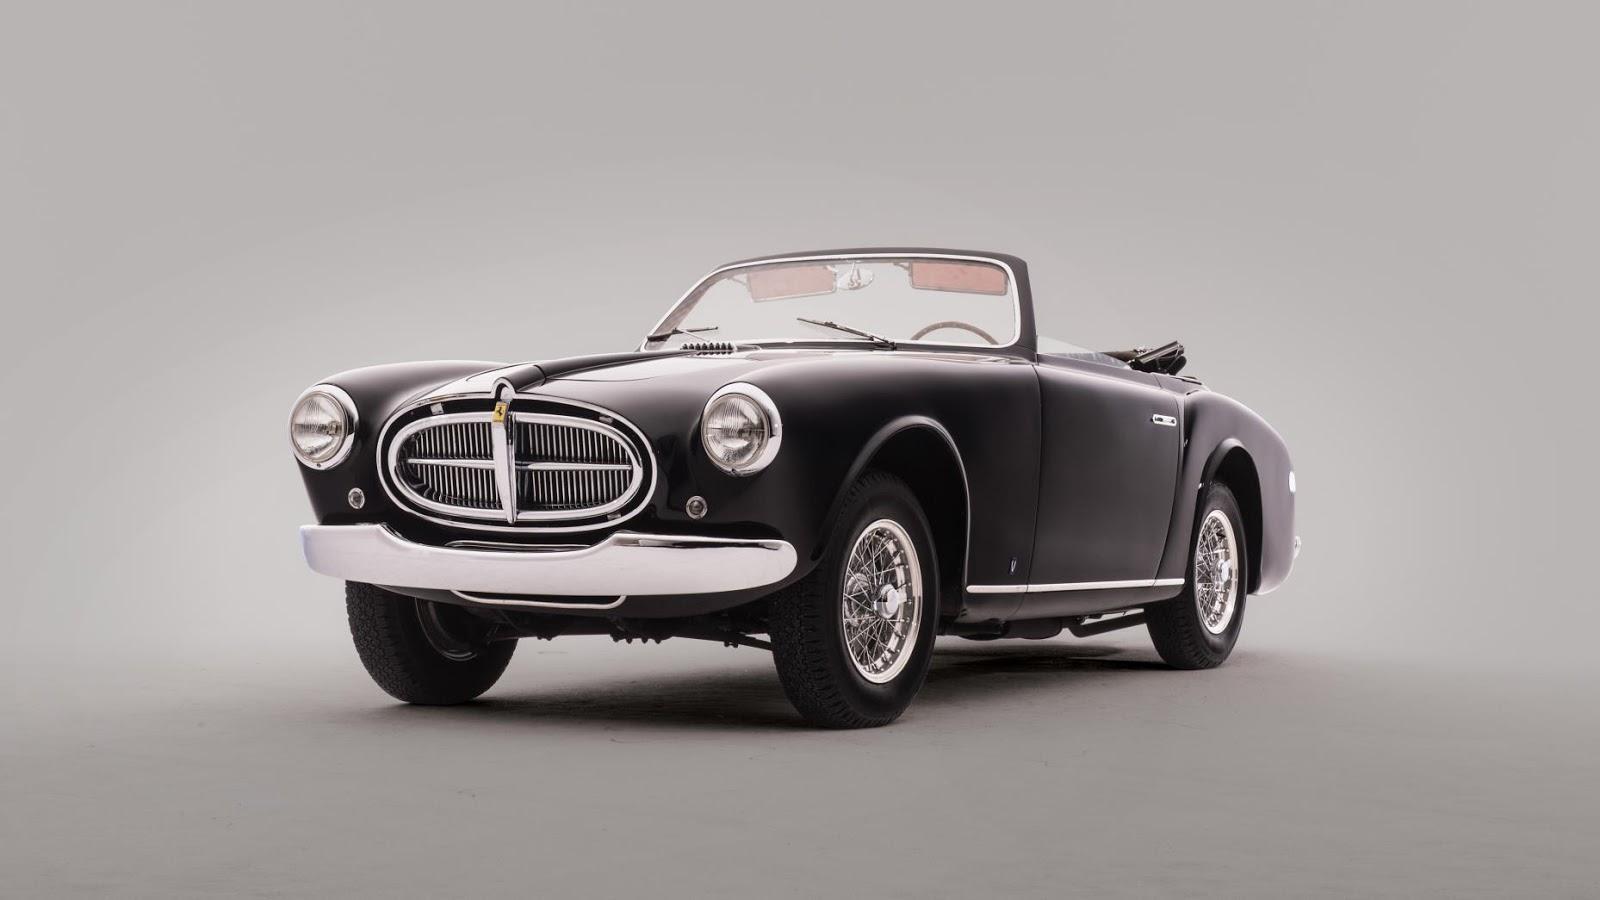 1952 Ferrari 212 of Inter Cabriolet by Vignale - £ 926k